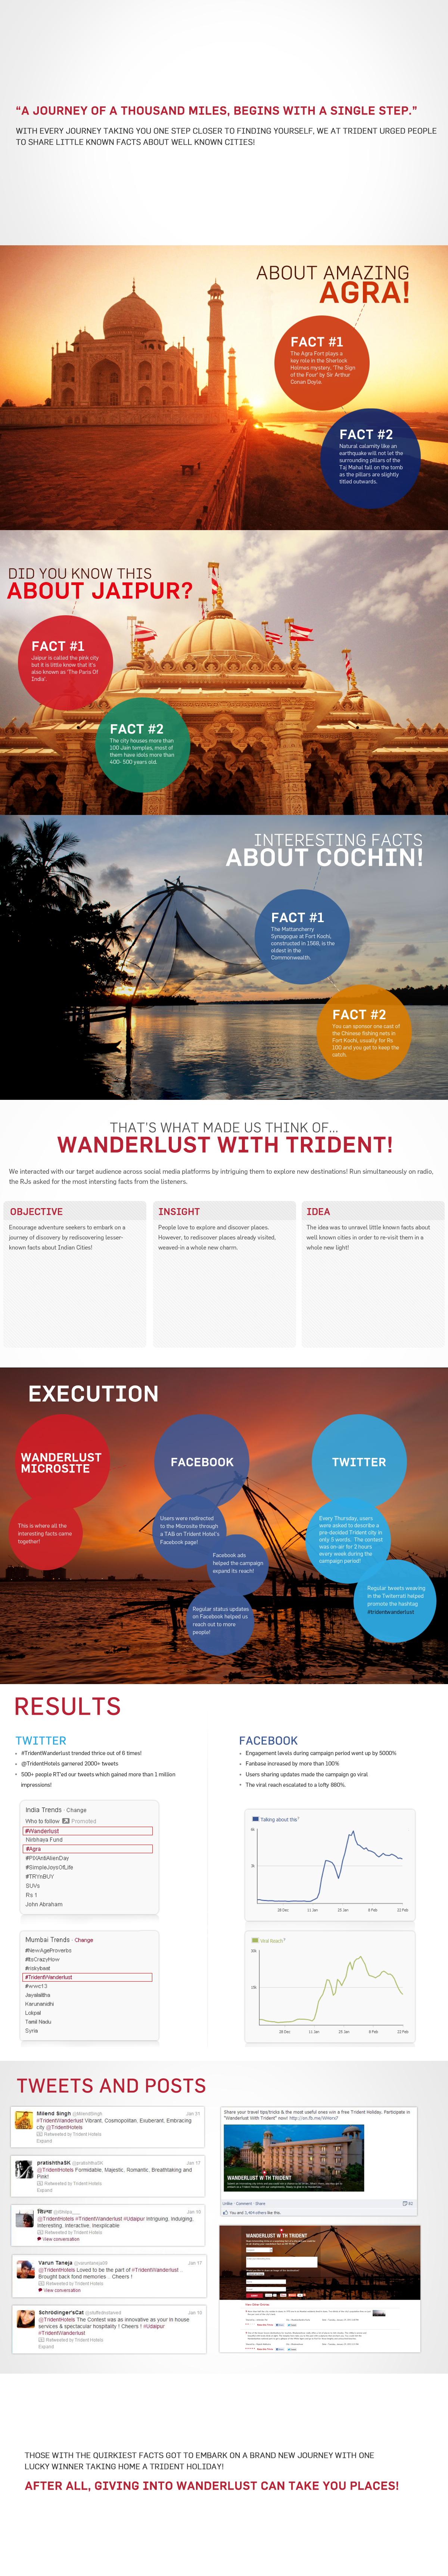 Trident Social Media Case study